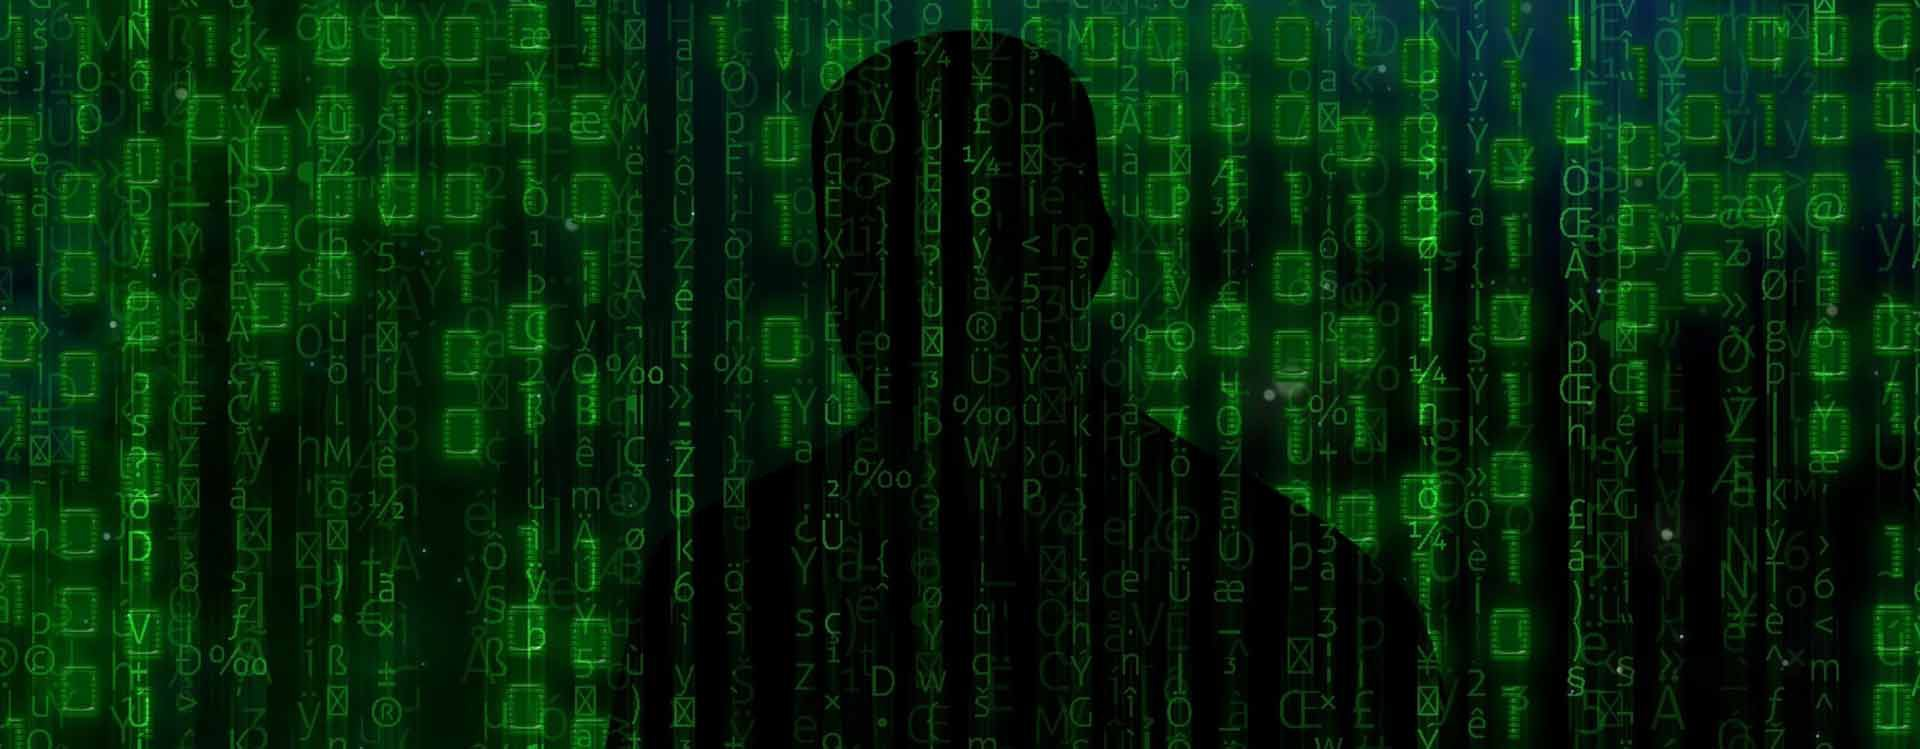 Internetstrafrecht | Rechtsanwalt Mirko Laudon ist spezialisiert auf IT- und Internetstrafrecht